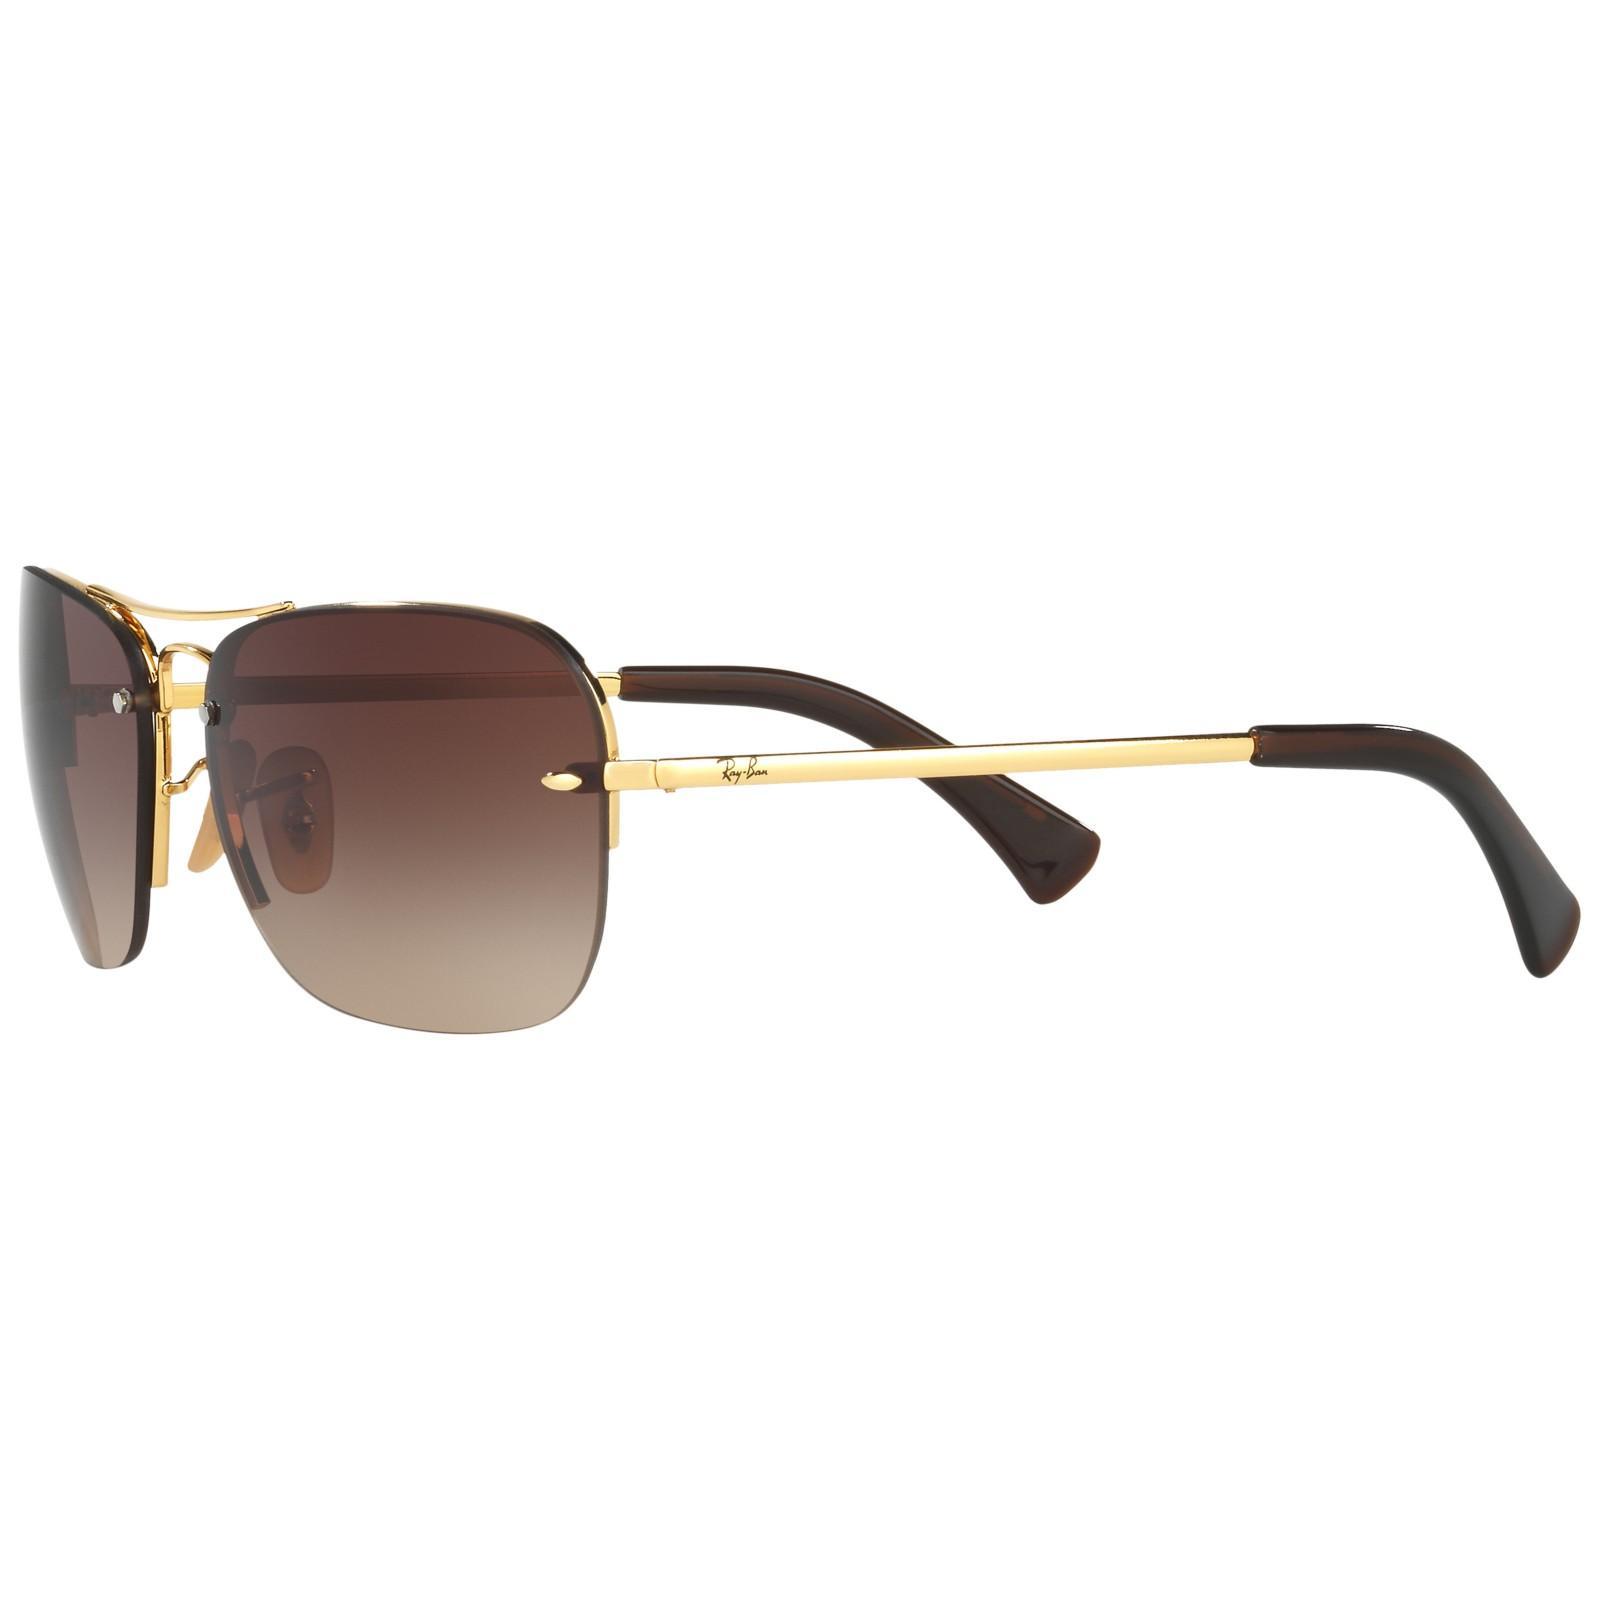 Ray-Ban Rb3541 Rectangular Gradient Sunglasses in Brown (Metallic)